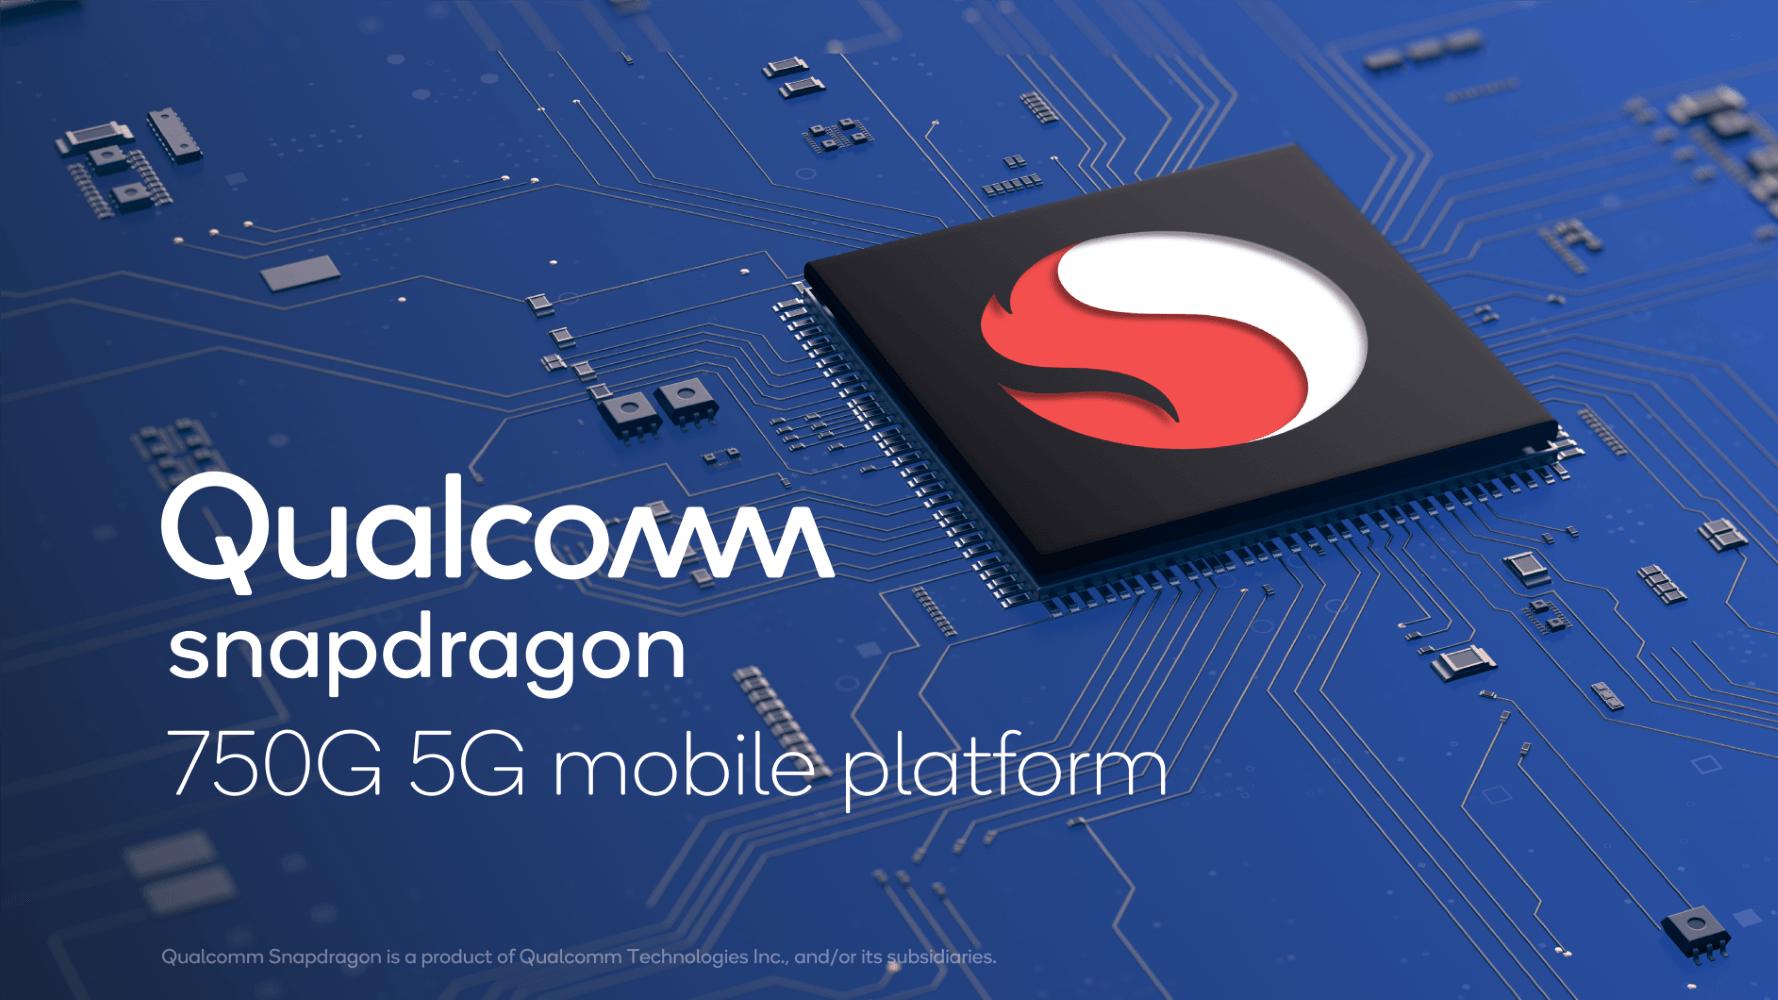 small_qualcomm_snapdragon_750g_5g_mobile_platform_graphic